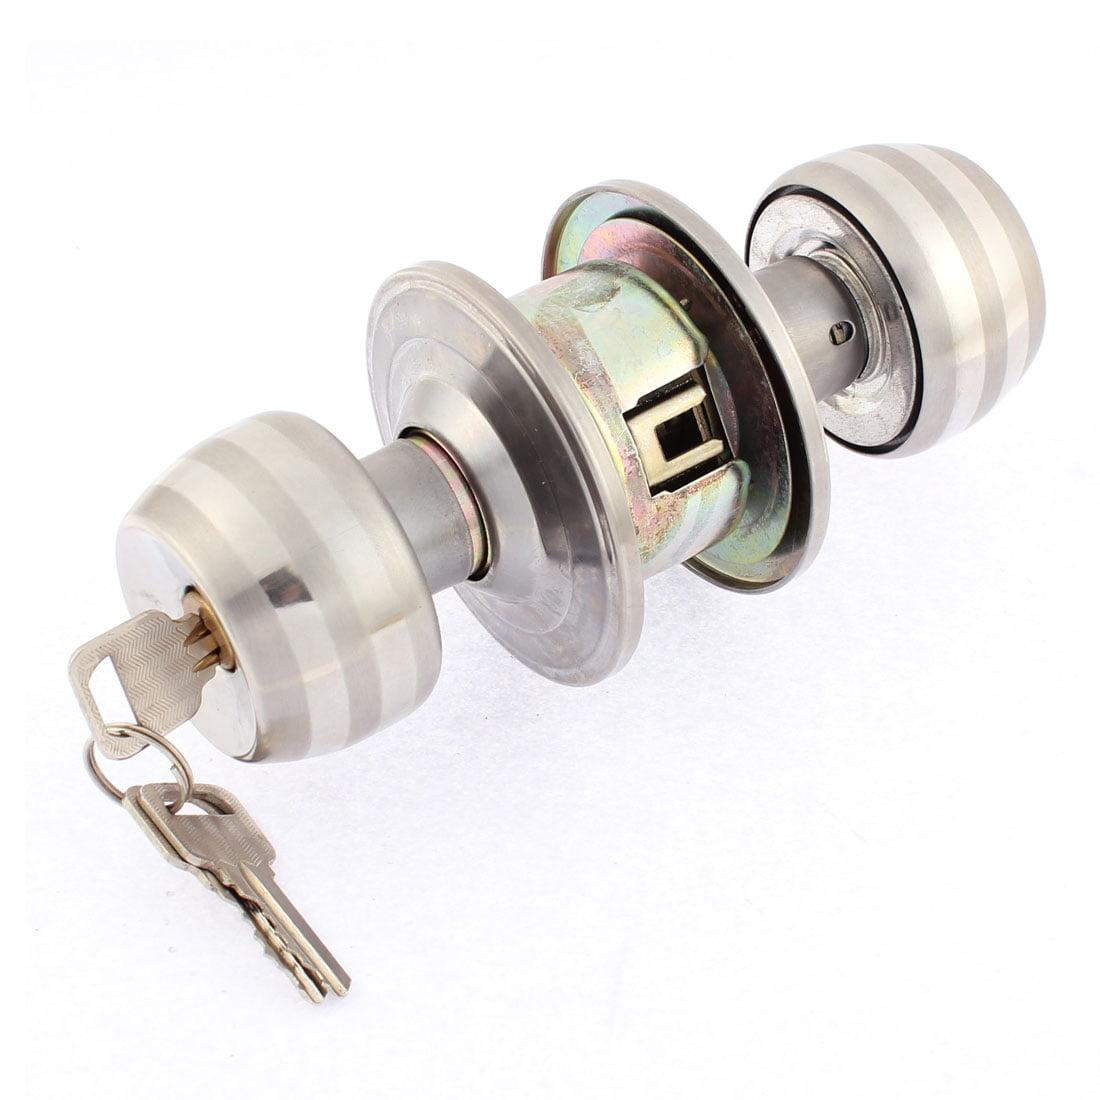 Bedroom Bathroom Door Locks with Keys Security Entry Lever Knob Handle Lockset